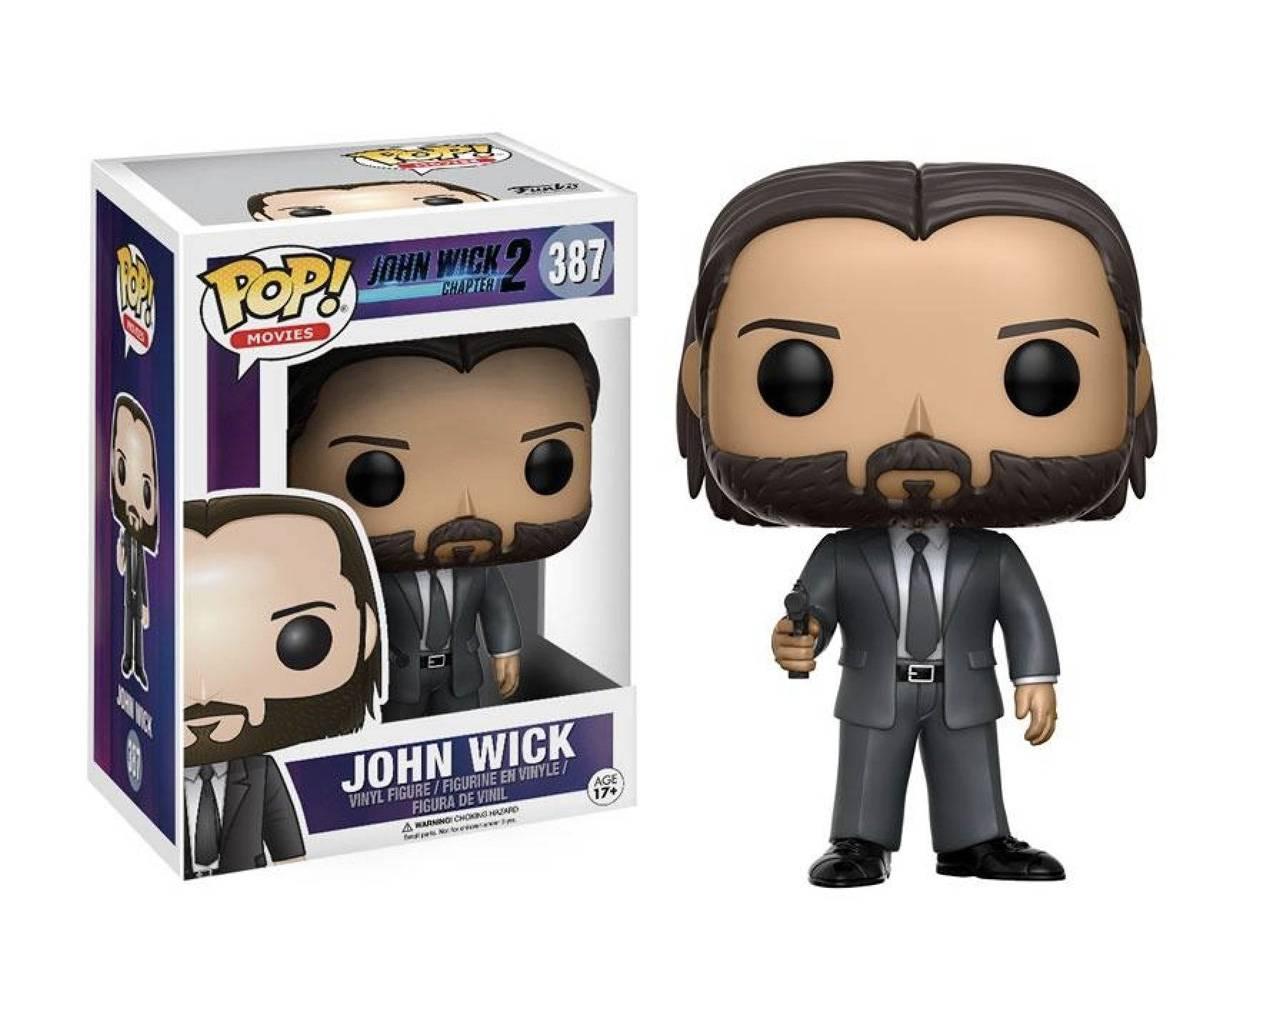 John Wick Pop! Vinyl